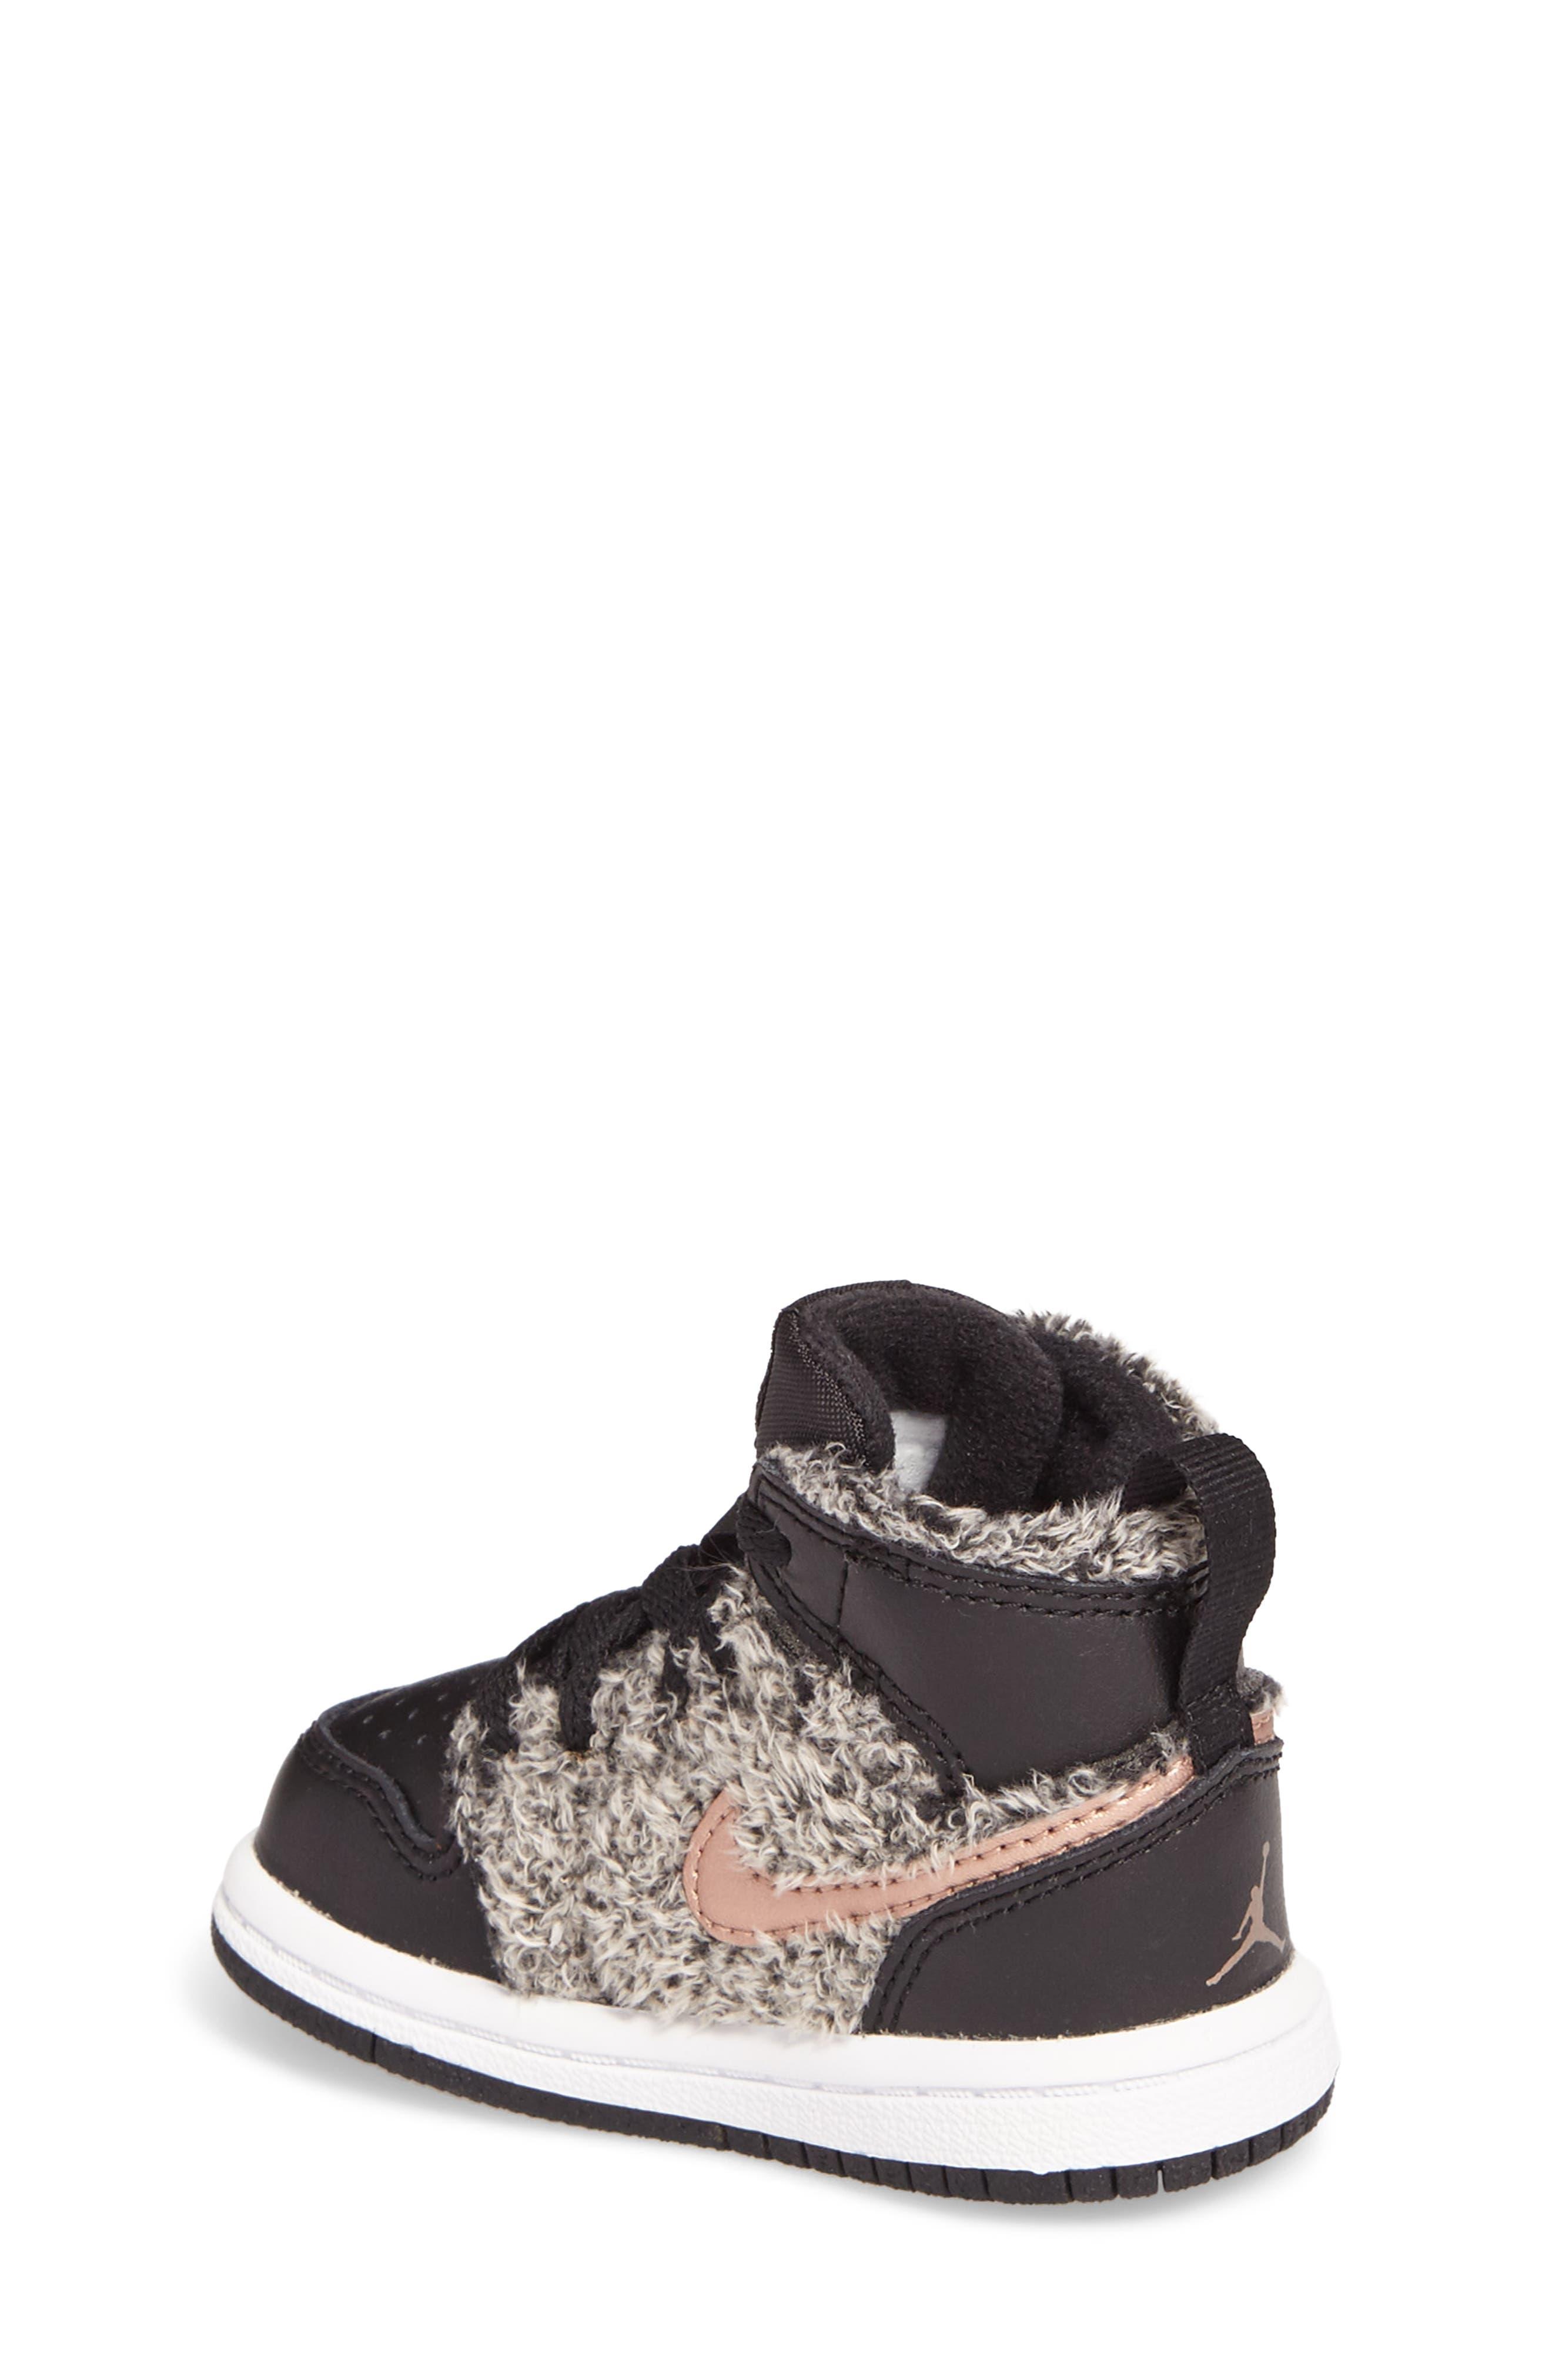 Alternate Image 2  - Nike Air Jordan 1 Retro High Top Basketball Shoe (Baby, Walker and Toddler)